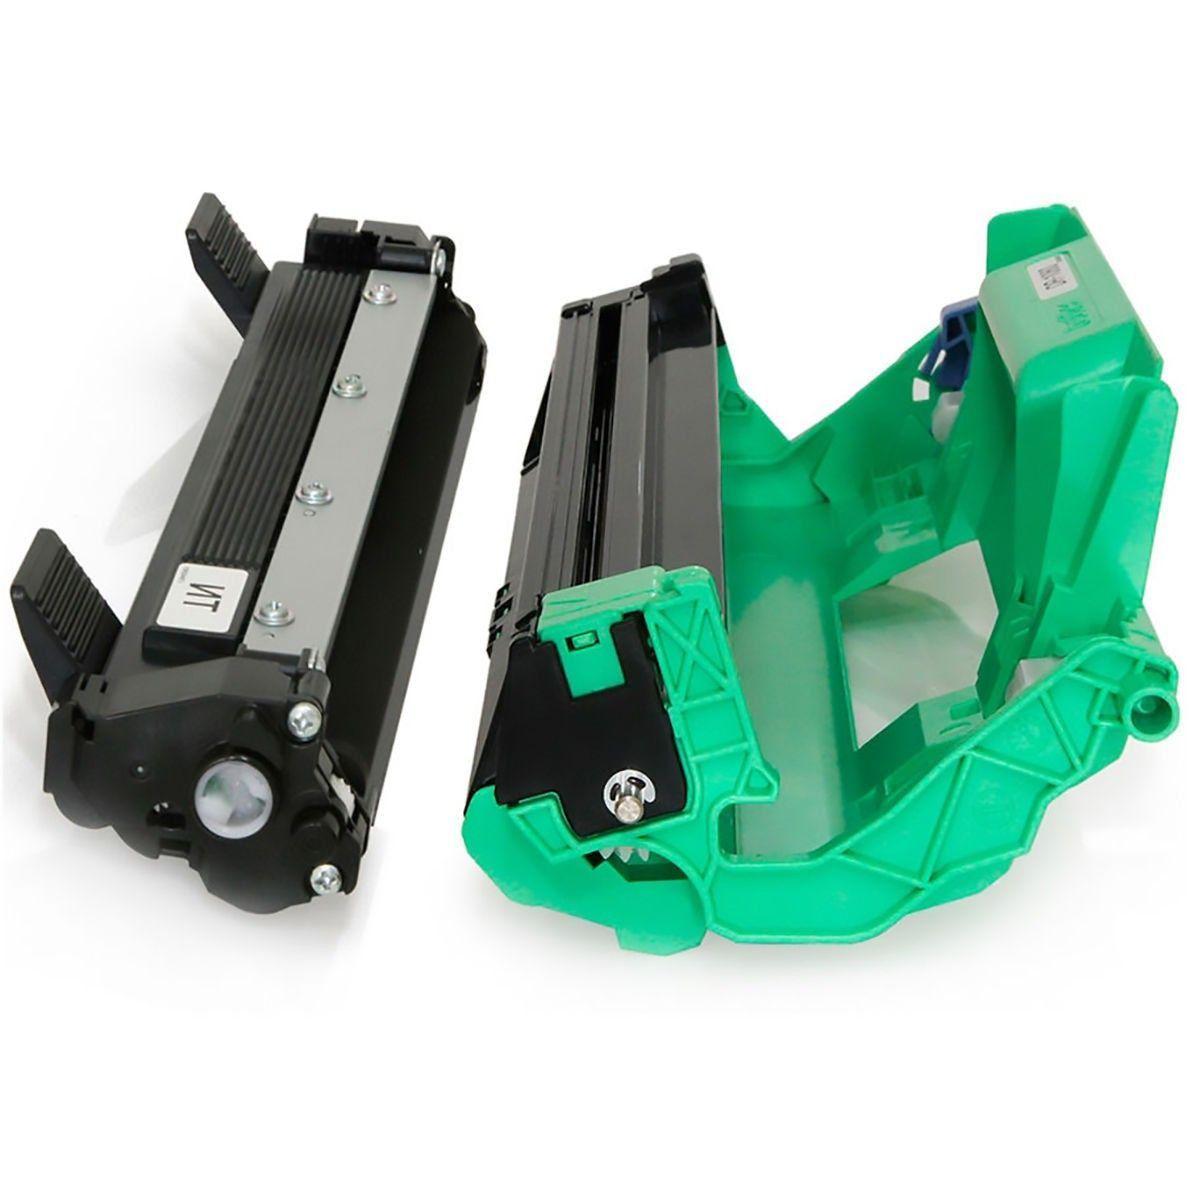 Compatível: Combo Fotocondutor DR1060 + Toner TN1000 para Brother HL-1112 1212w DCP-1512 DCP-1602w 1612w 1617nw HL1212